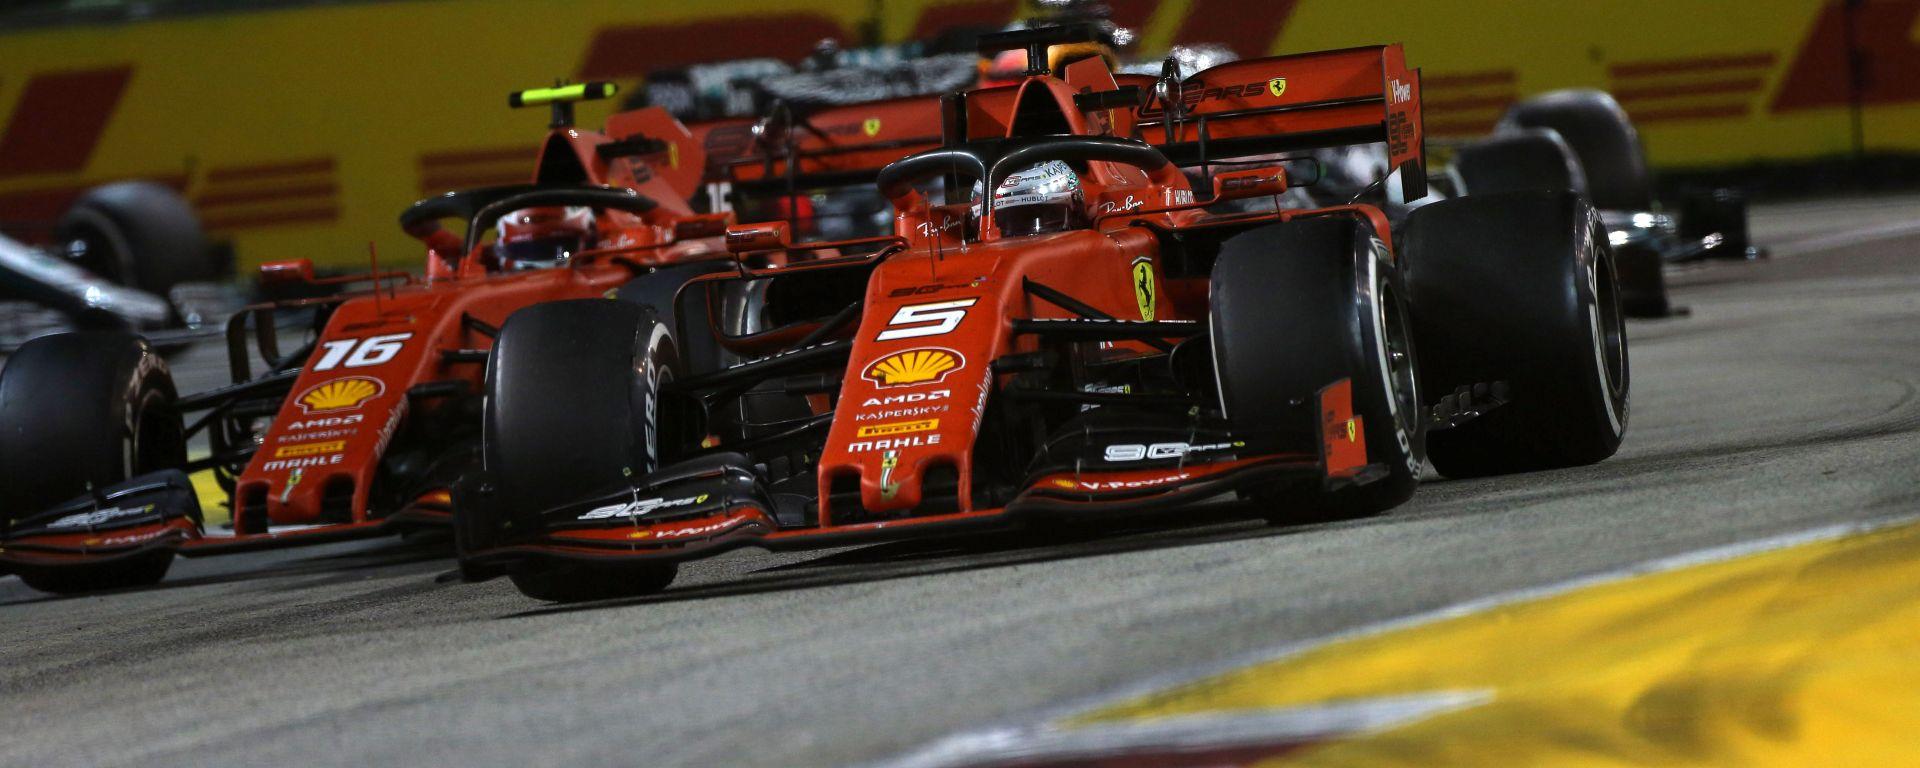 F1 GP Singapore 2019, Marina Bay, Sebastian Vettel e Charles Leclerc (Ferrari)